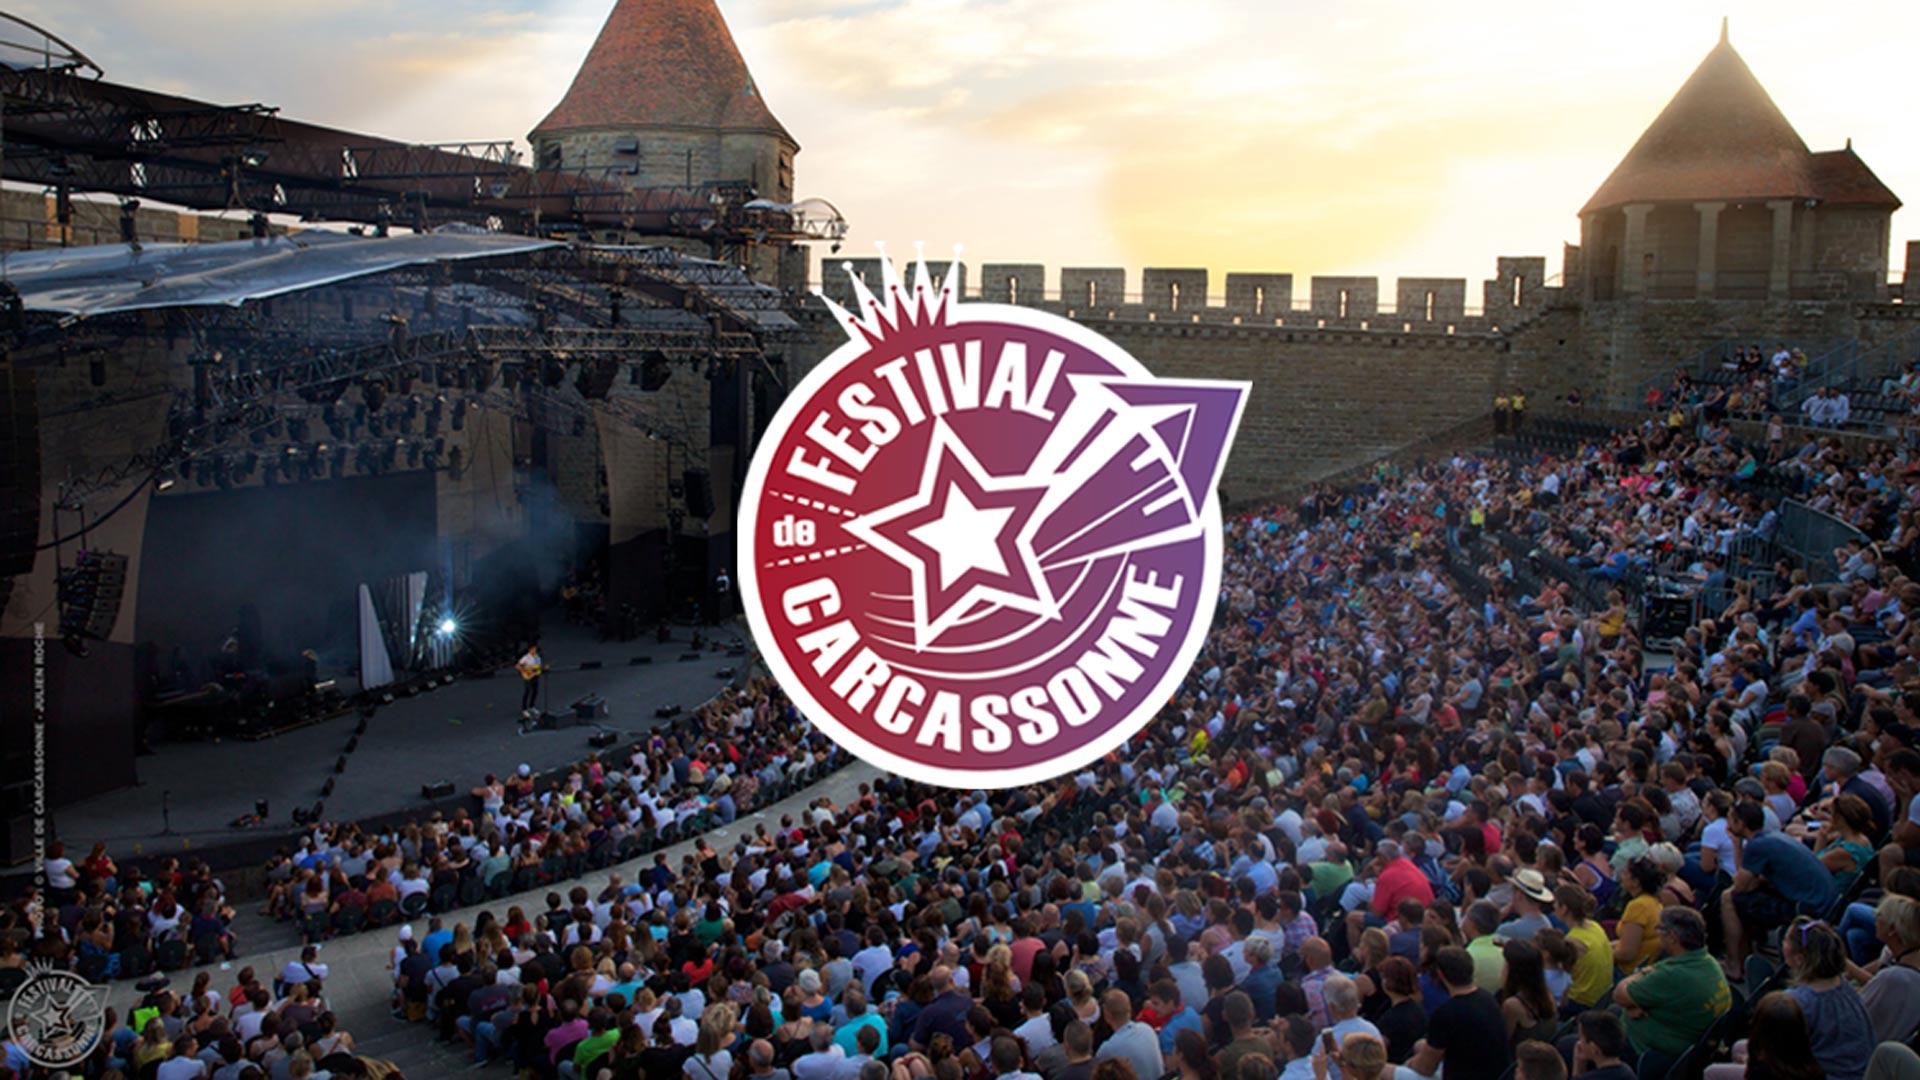 Soprano, Pascal Obispo, Kendji Girac, Hoshi et Angèle au Festival de Carcassonne : gagnez vos places avec TF1 !